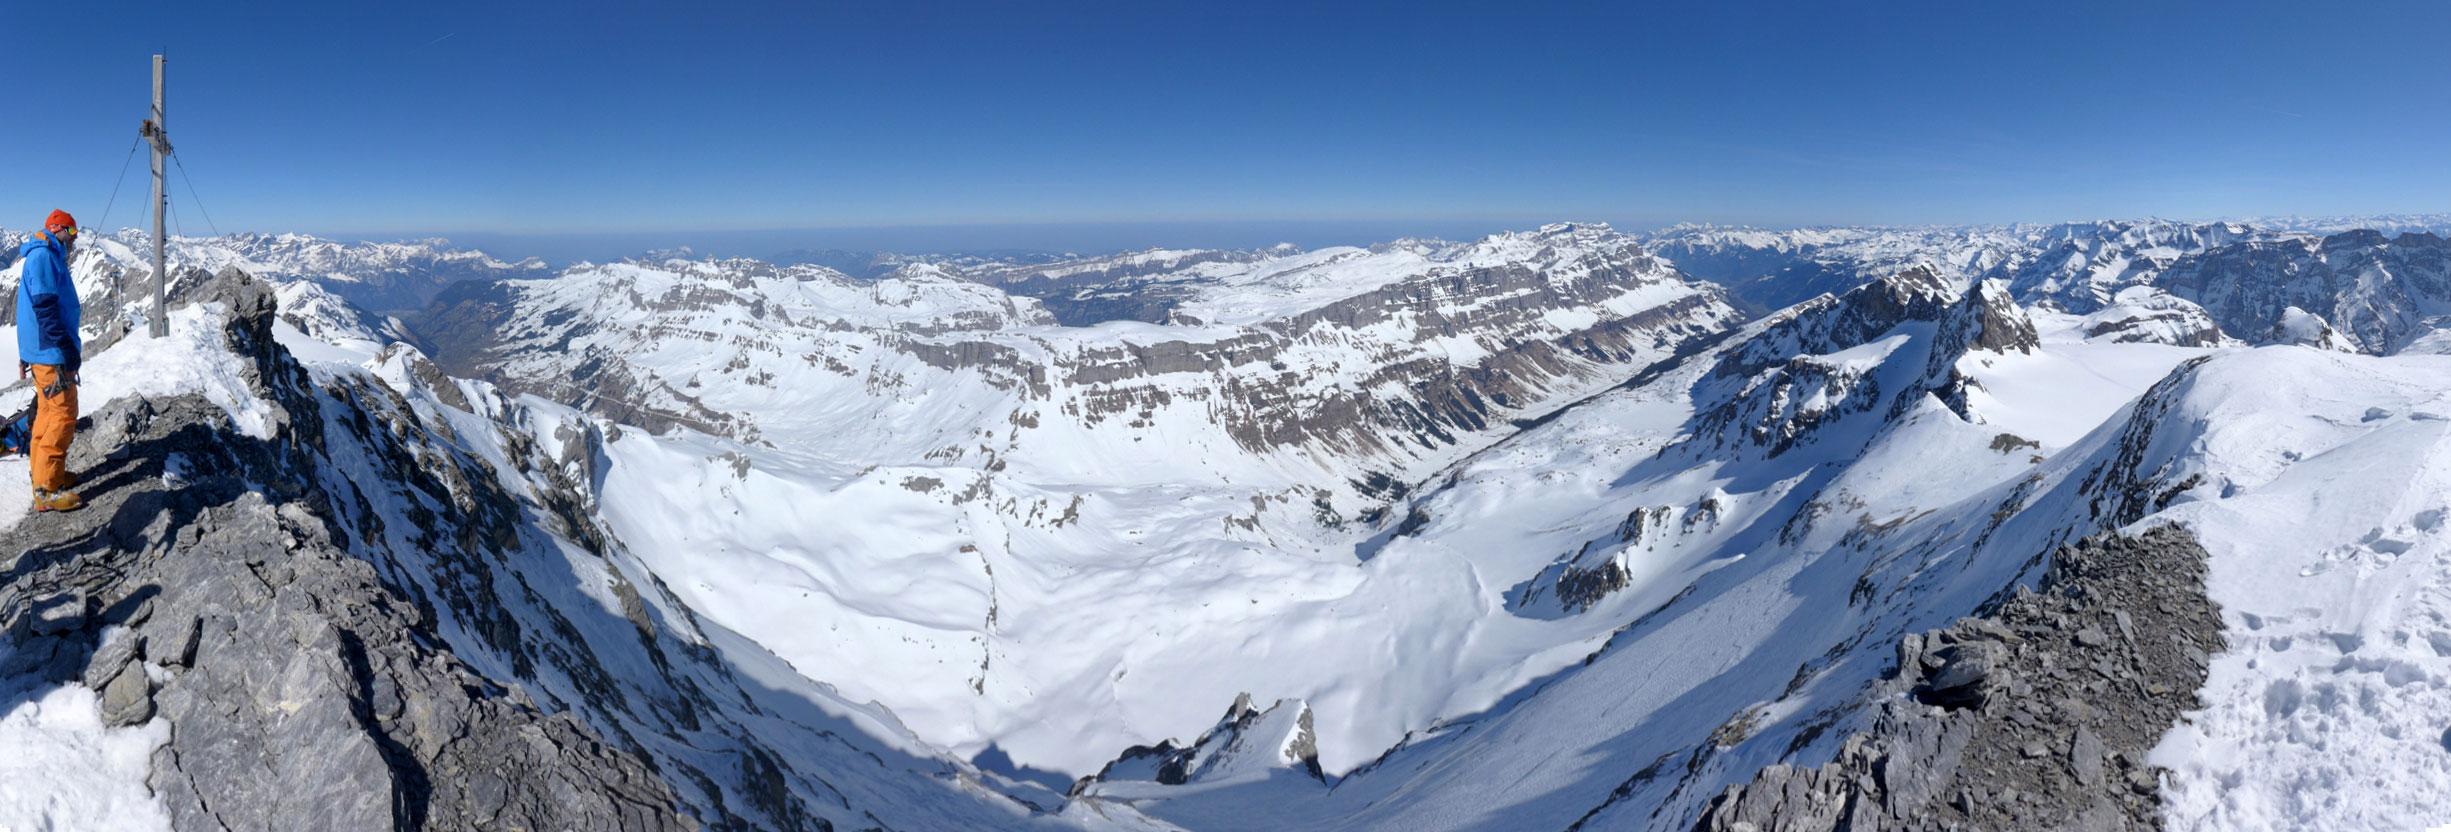 Clariden S, from Planurahütte Glarner Alpen Switzerland panorama 21